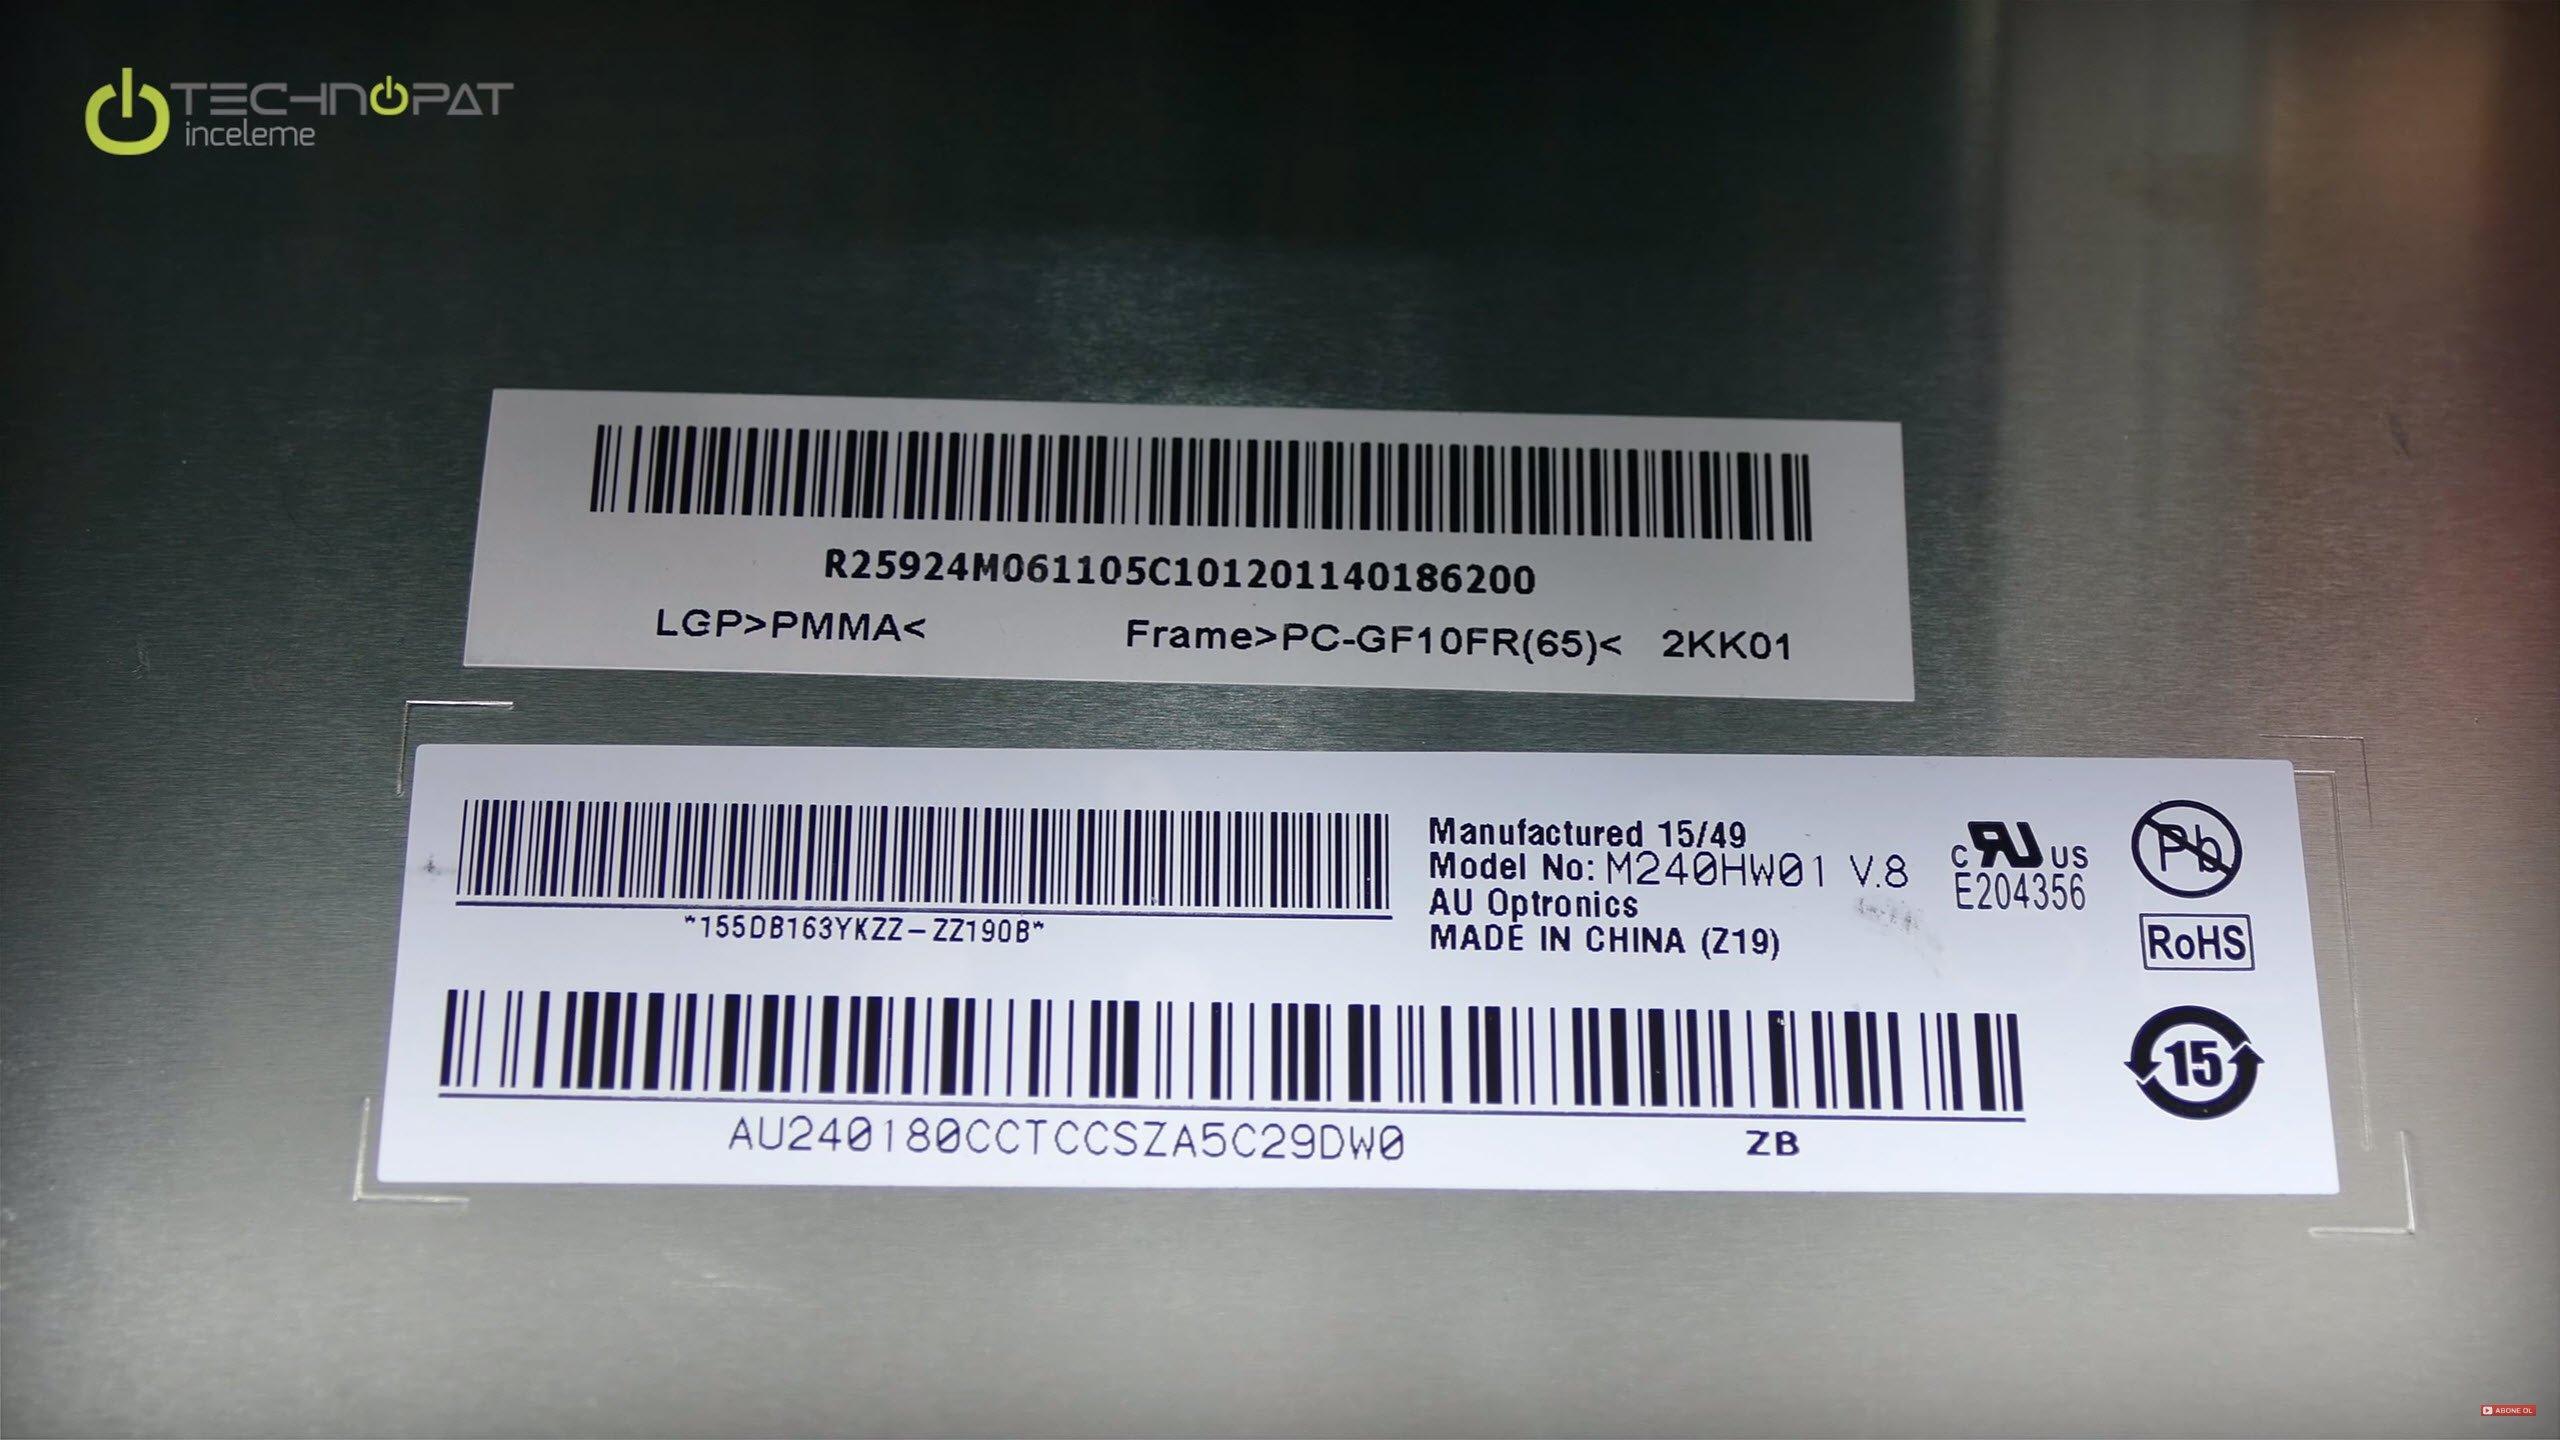 viewsonic-xg2401-144-hz-1-ms-oyuncu-monitor-inceleme-panel-technopat